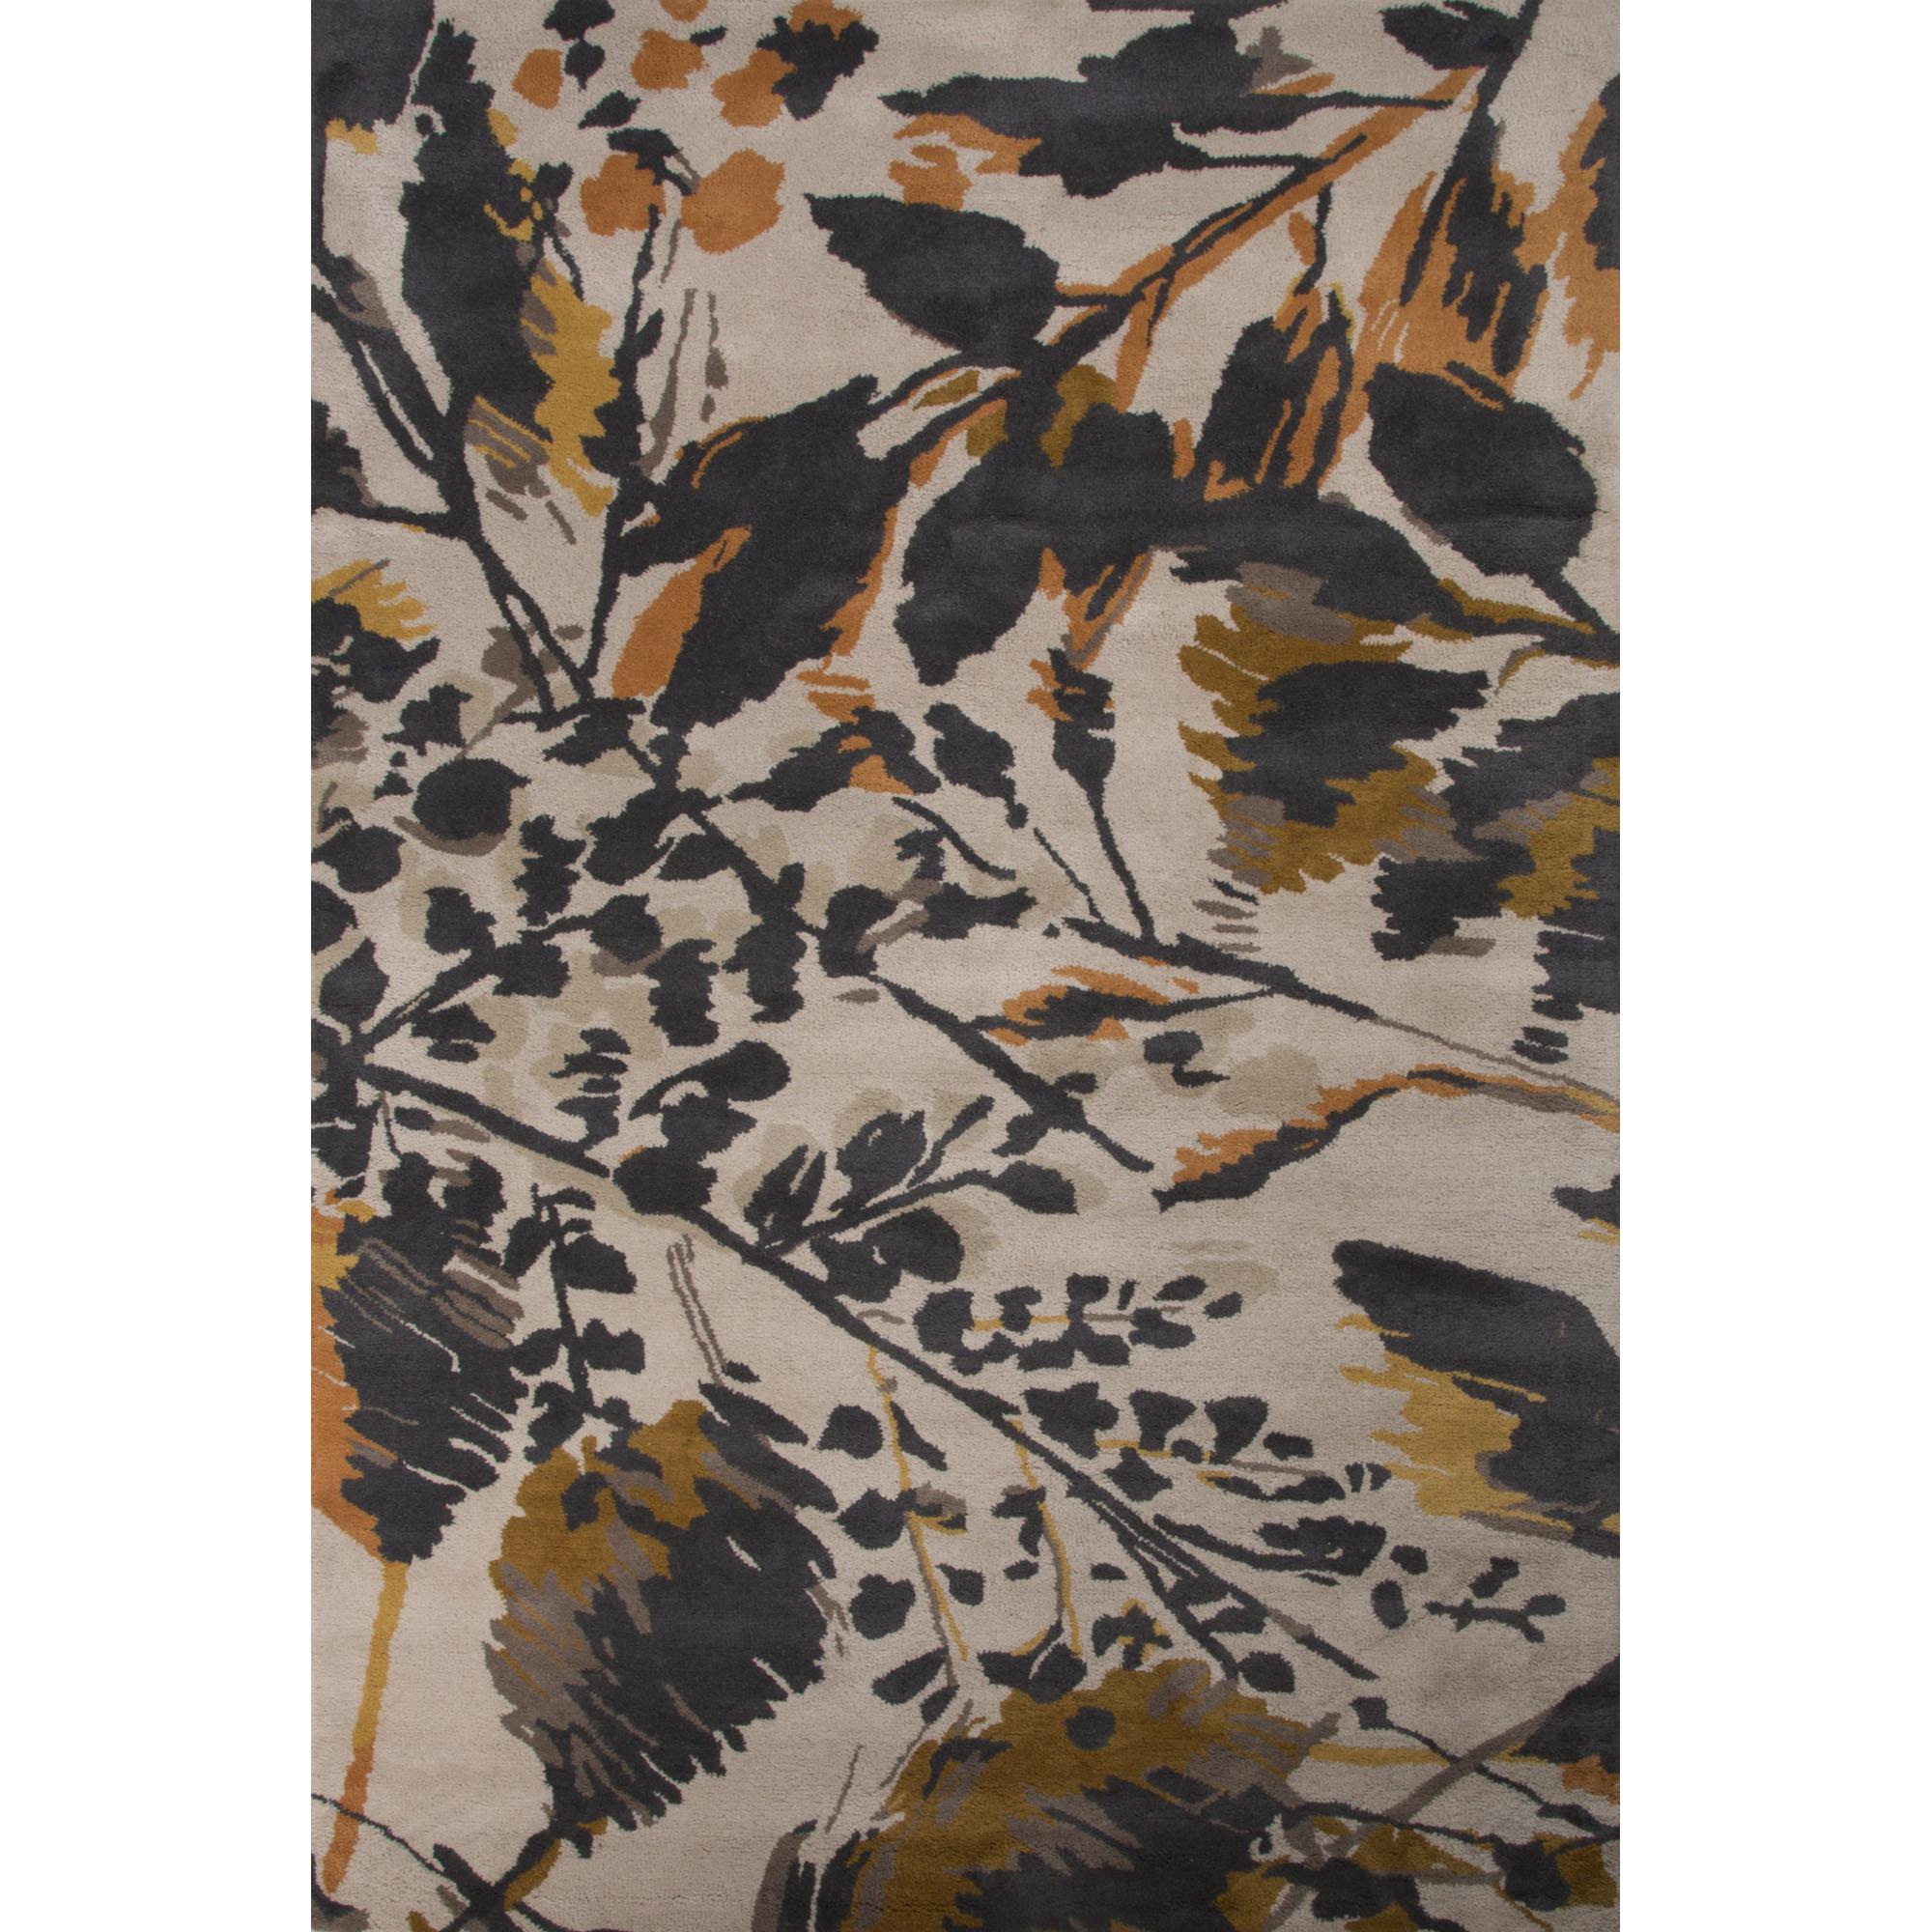 JAIPUR Rugs En Casa By Luli Sanchez Tufted 8 x 11 Rug - Item Number: RUG118114